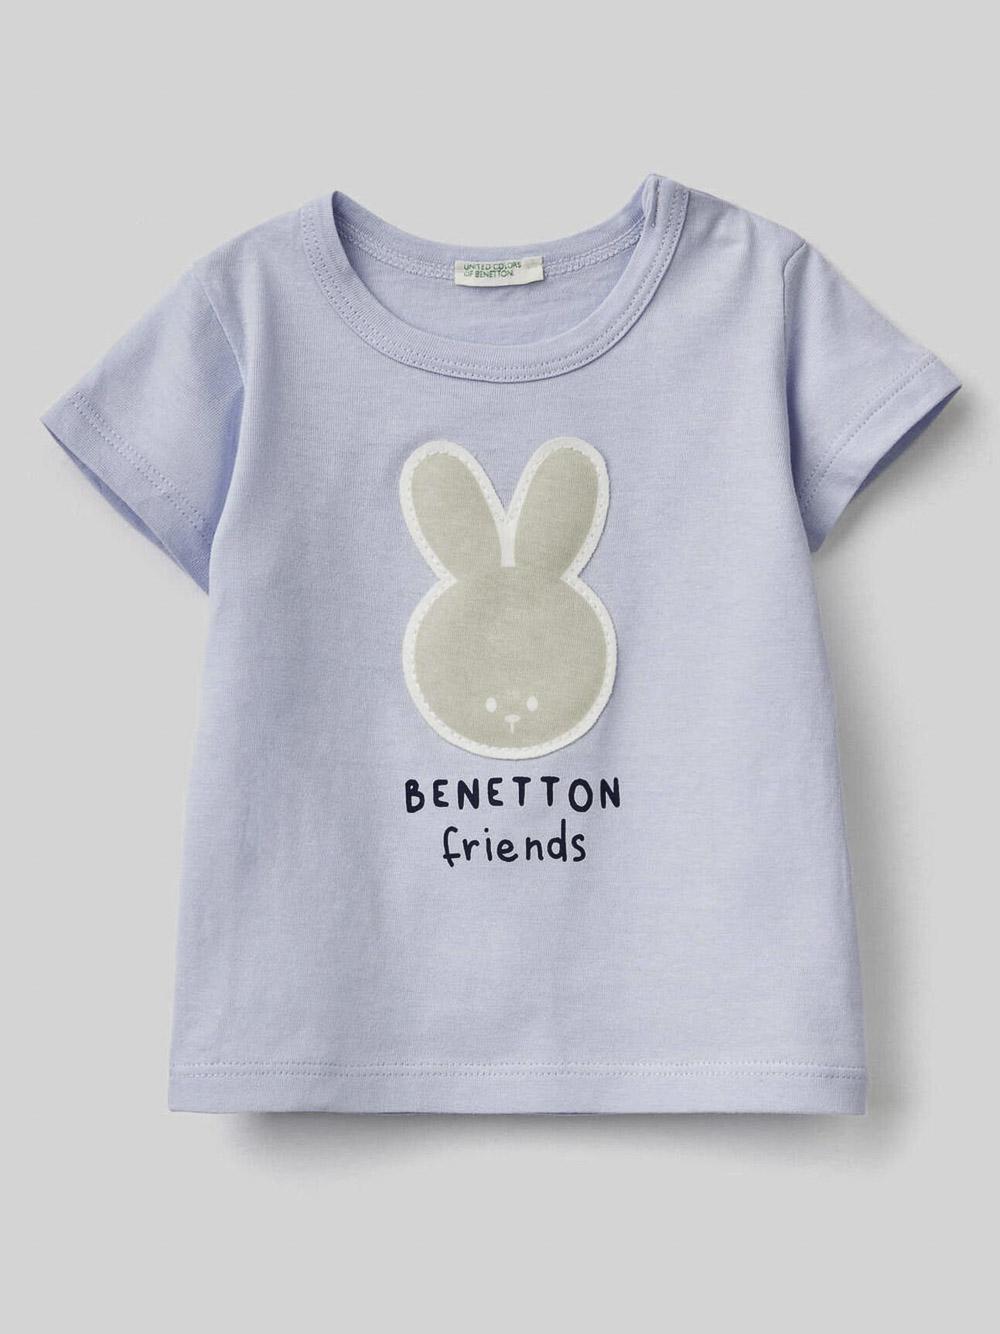 012 BENETTON T-SHIRT W 3I1XMM289 21P081